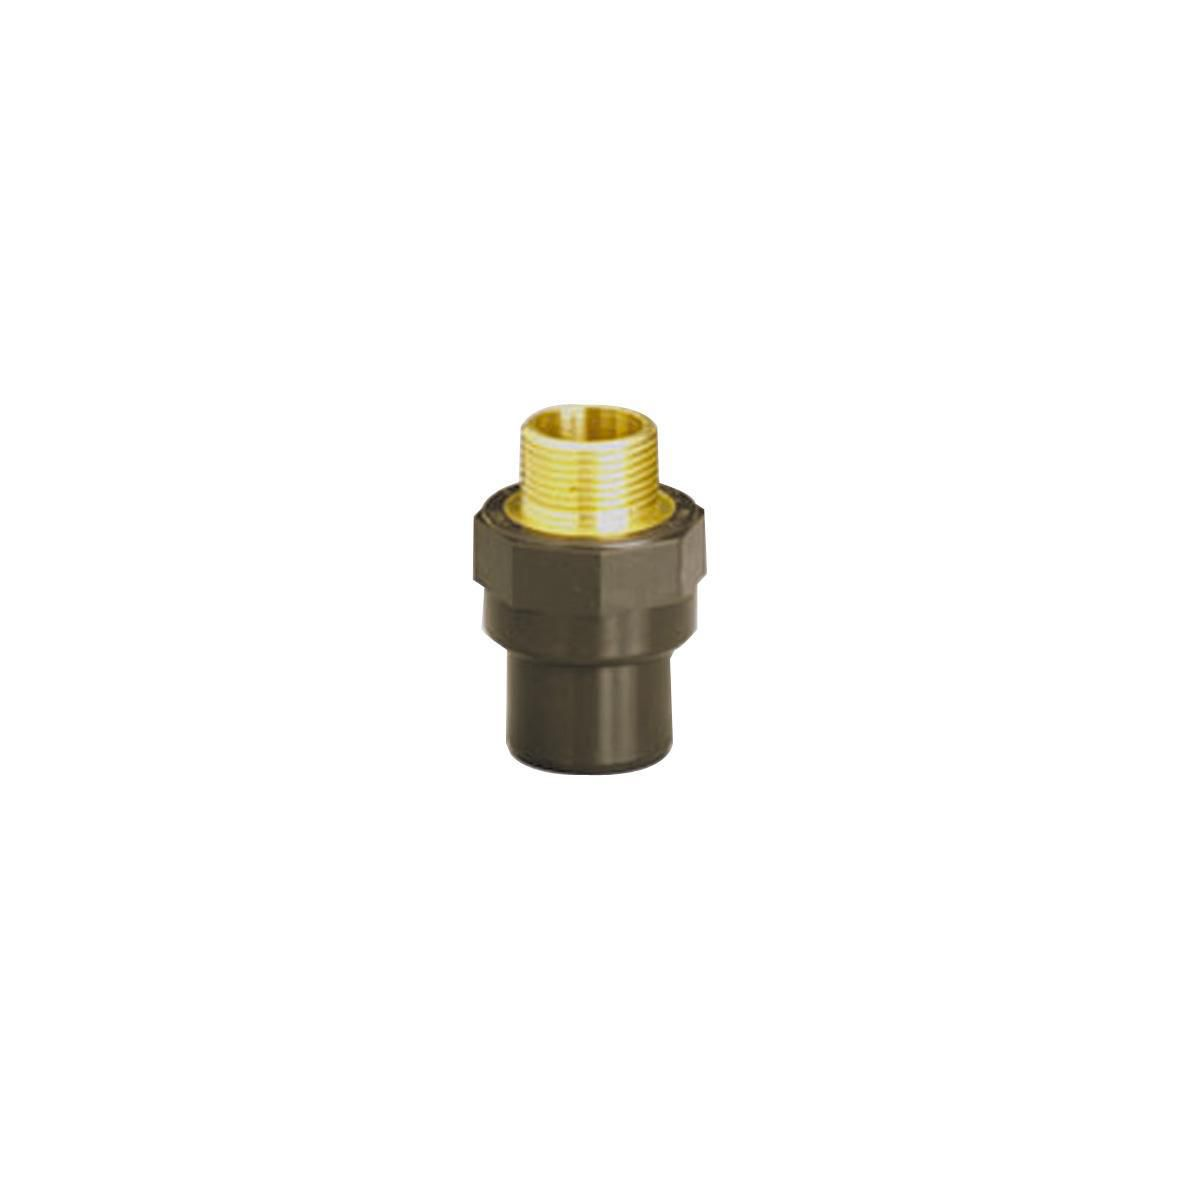 Embout avec filetage laiton B SYSTEM'O PVC/laiton femelle-mâle diamètre 16/20-1/2 réf. HEBL16